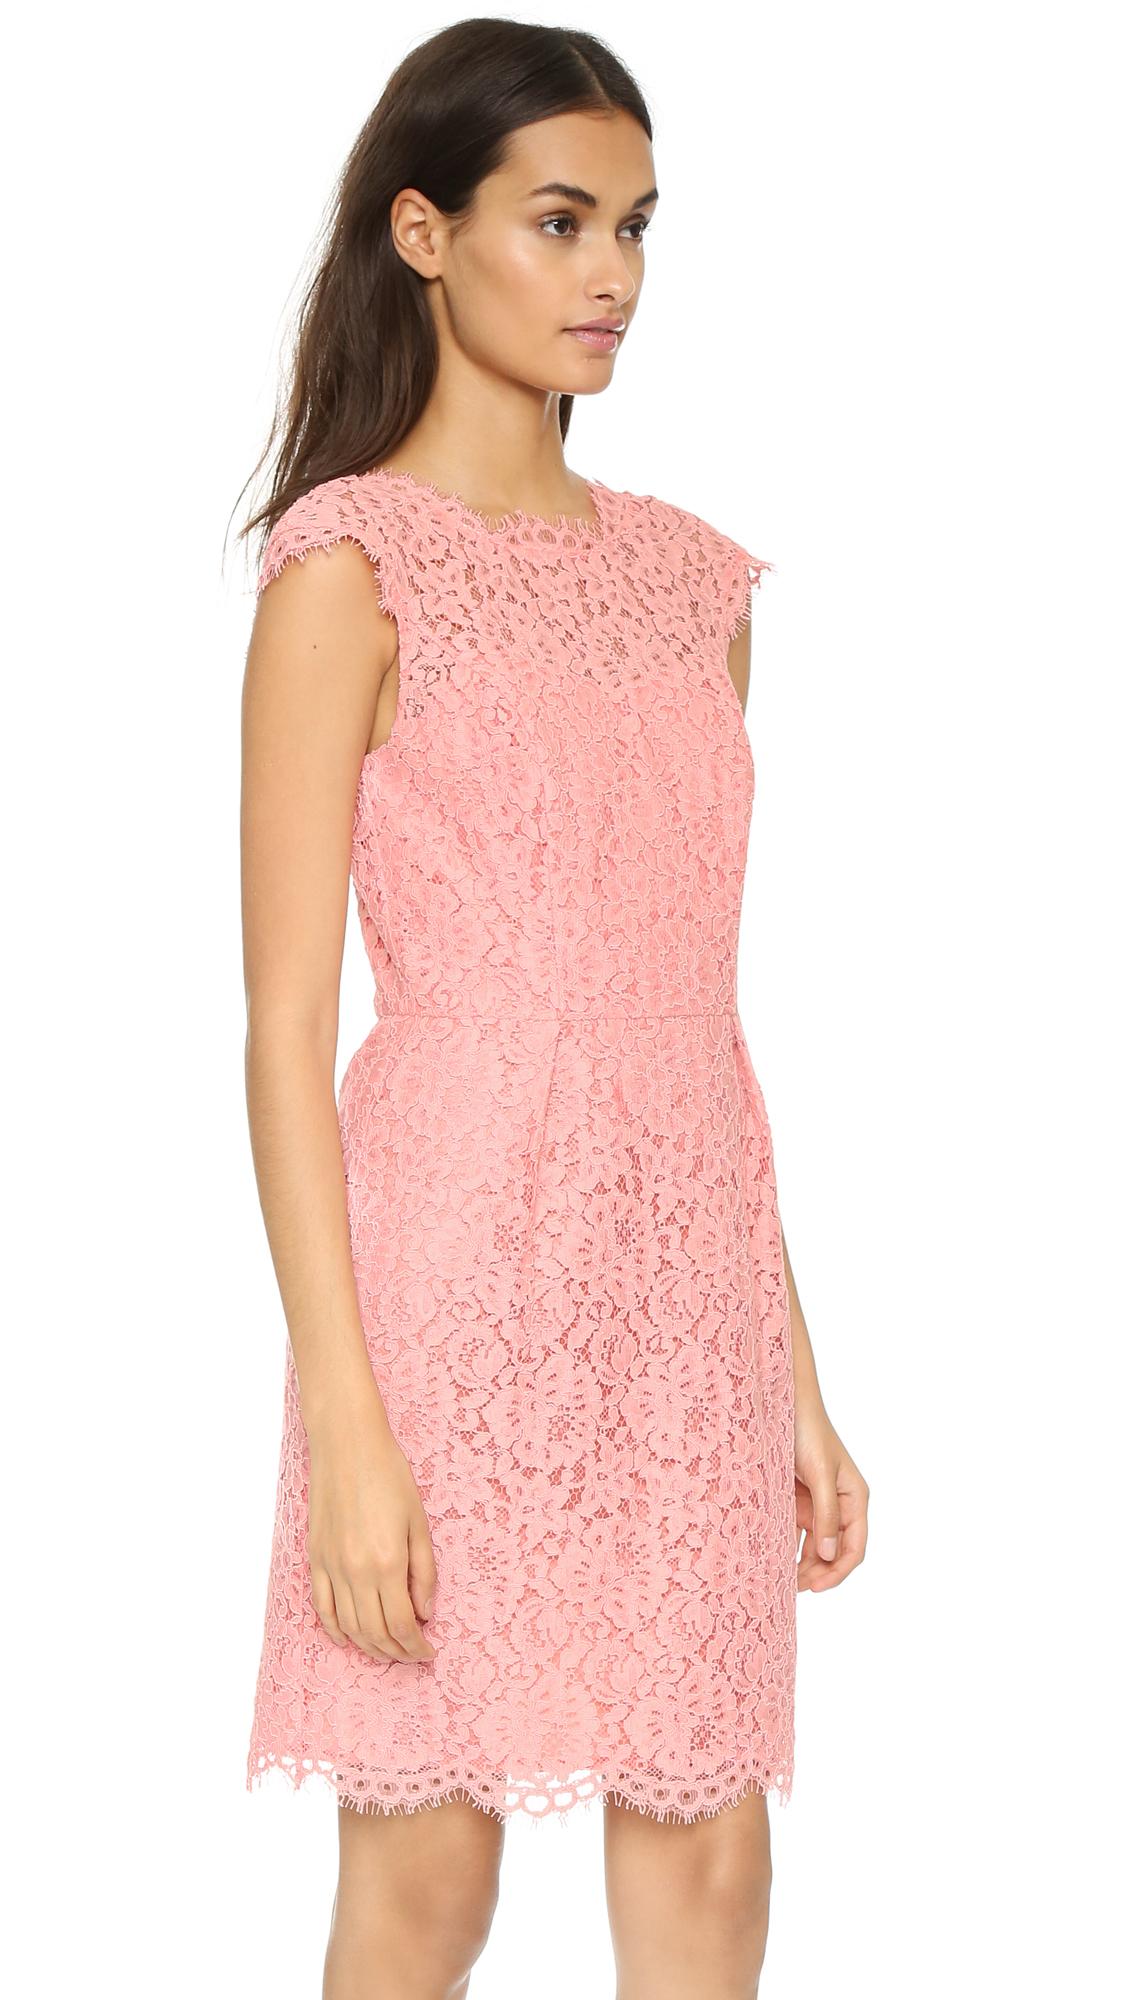 Shoshanna Olivia Dress - Peach in Pink   Lyst